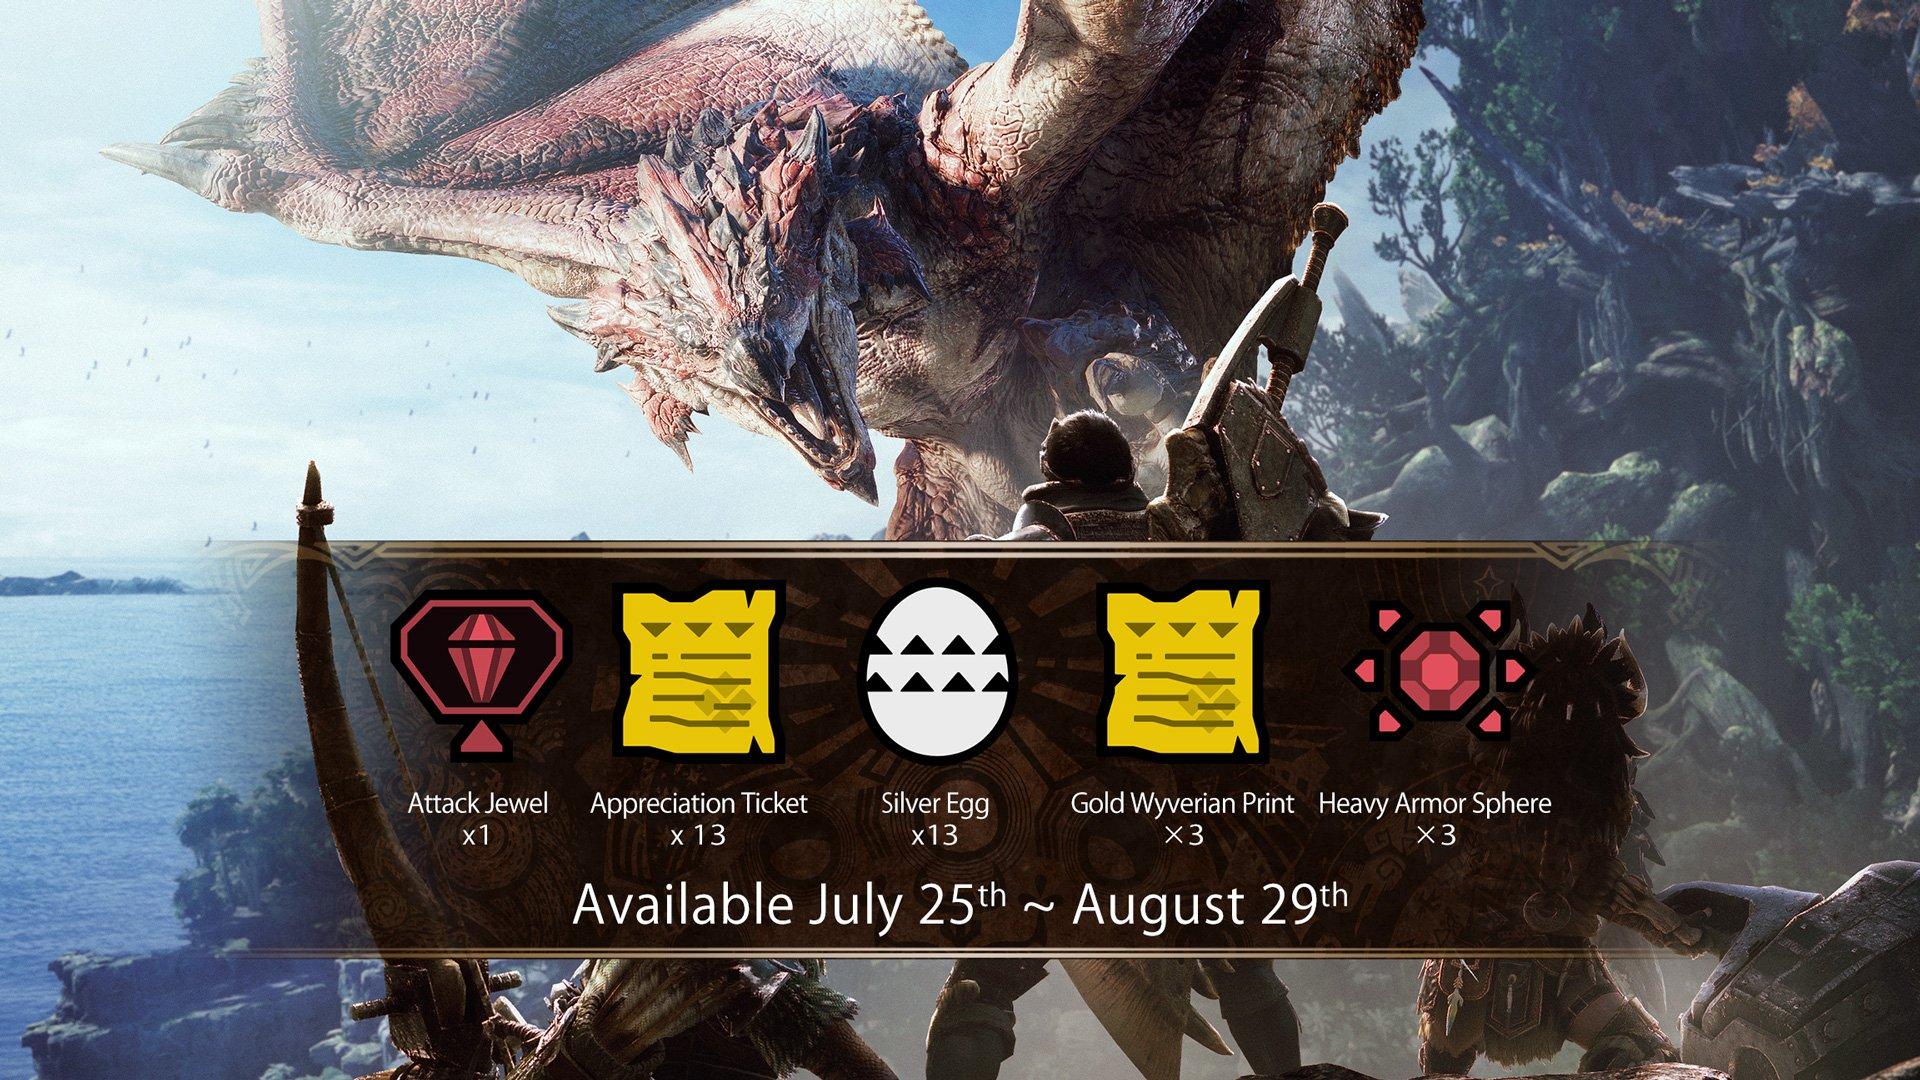 Monster Hunter: World shipments and digital sales top 13 million - Gematsu